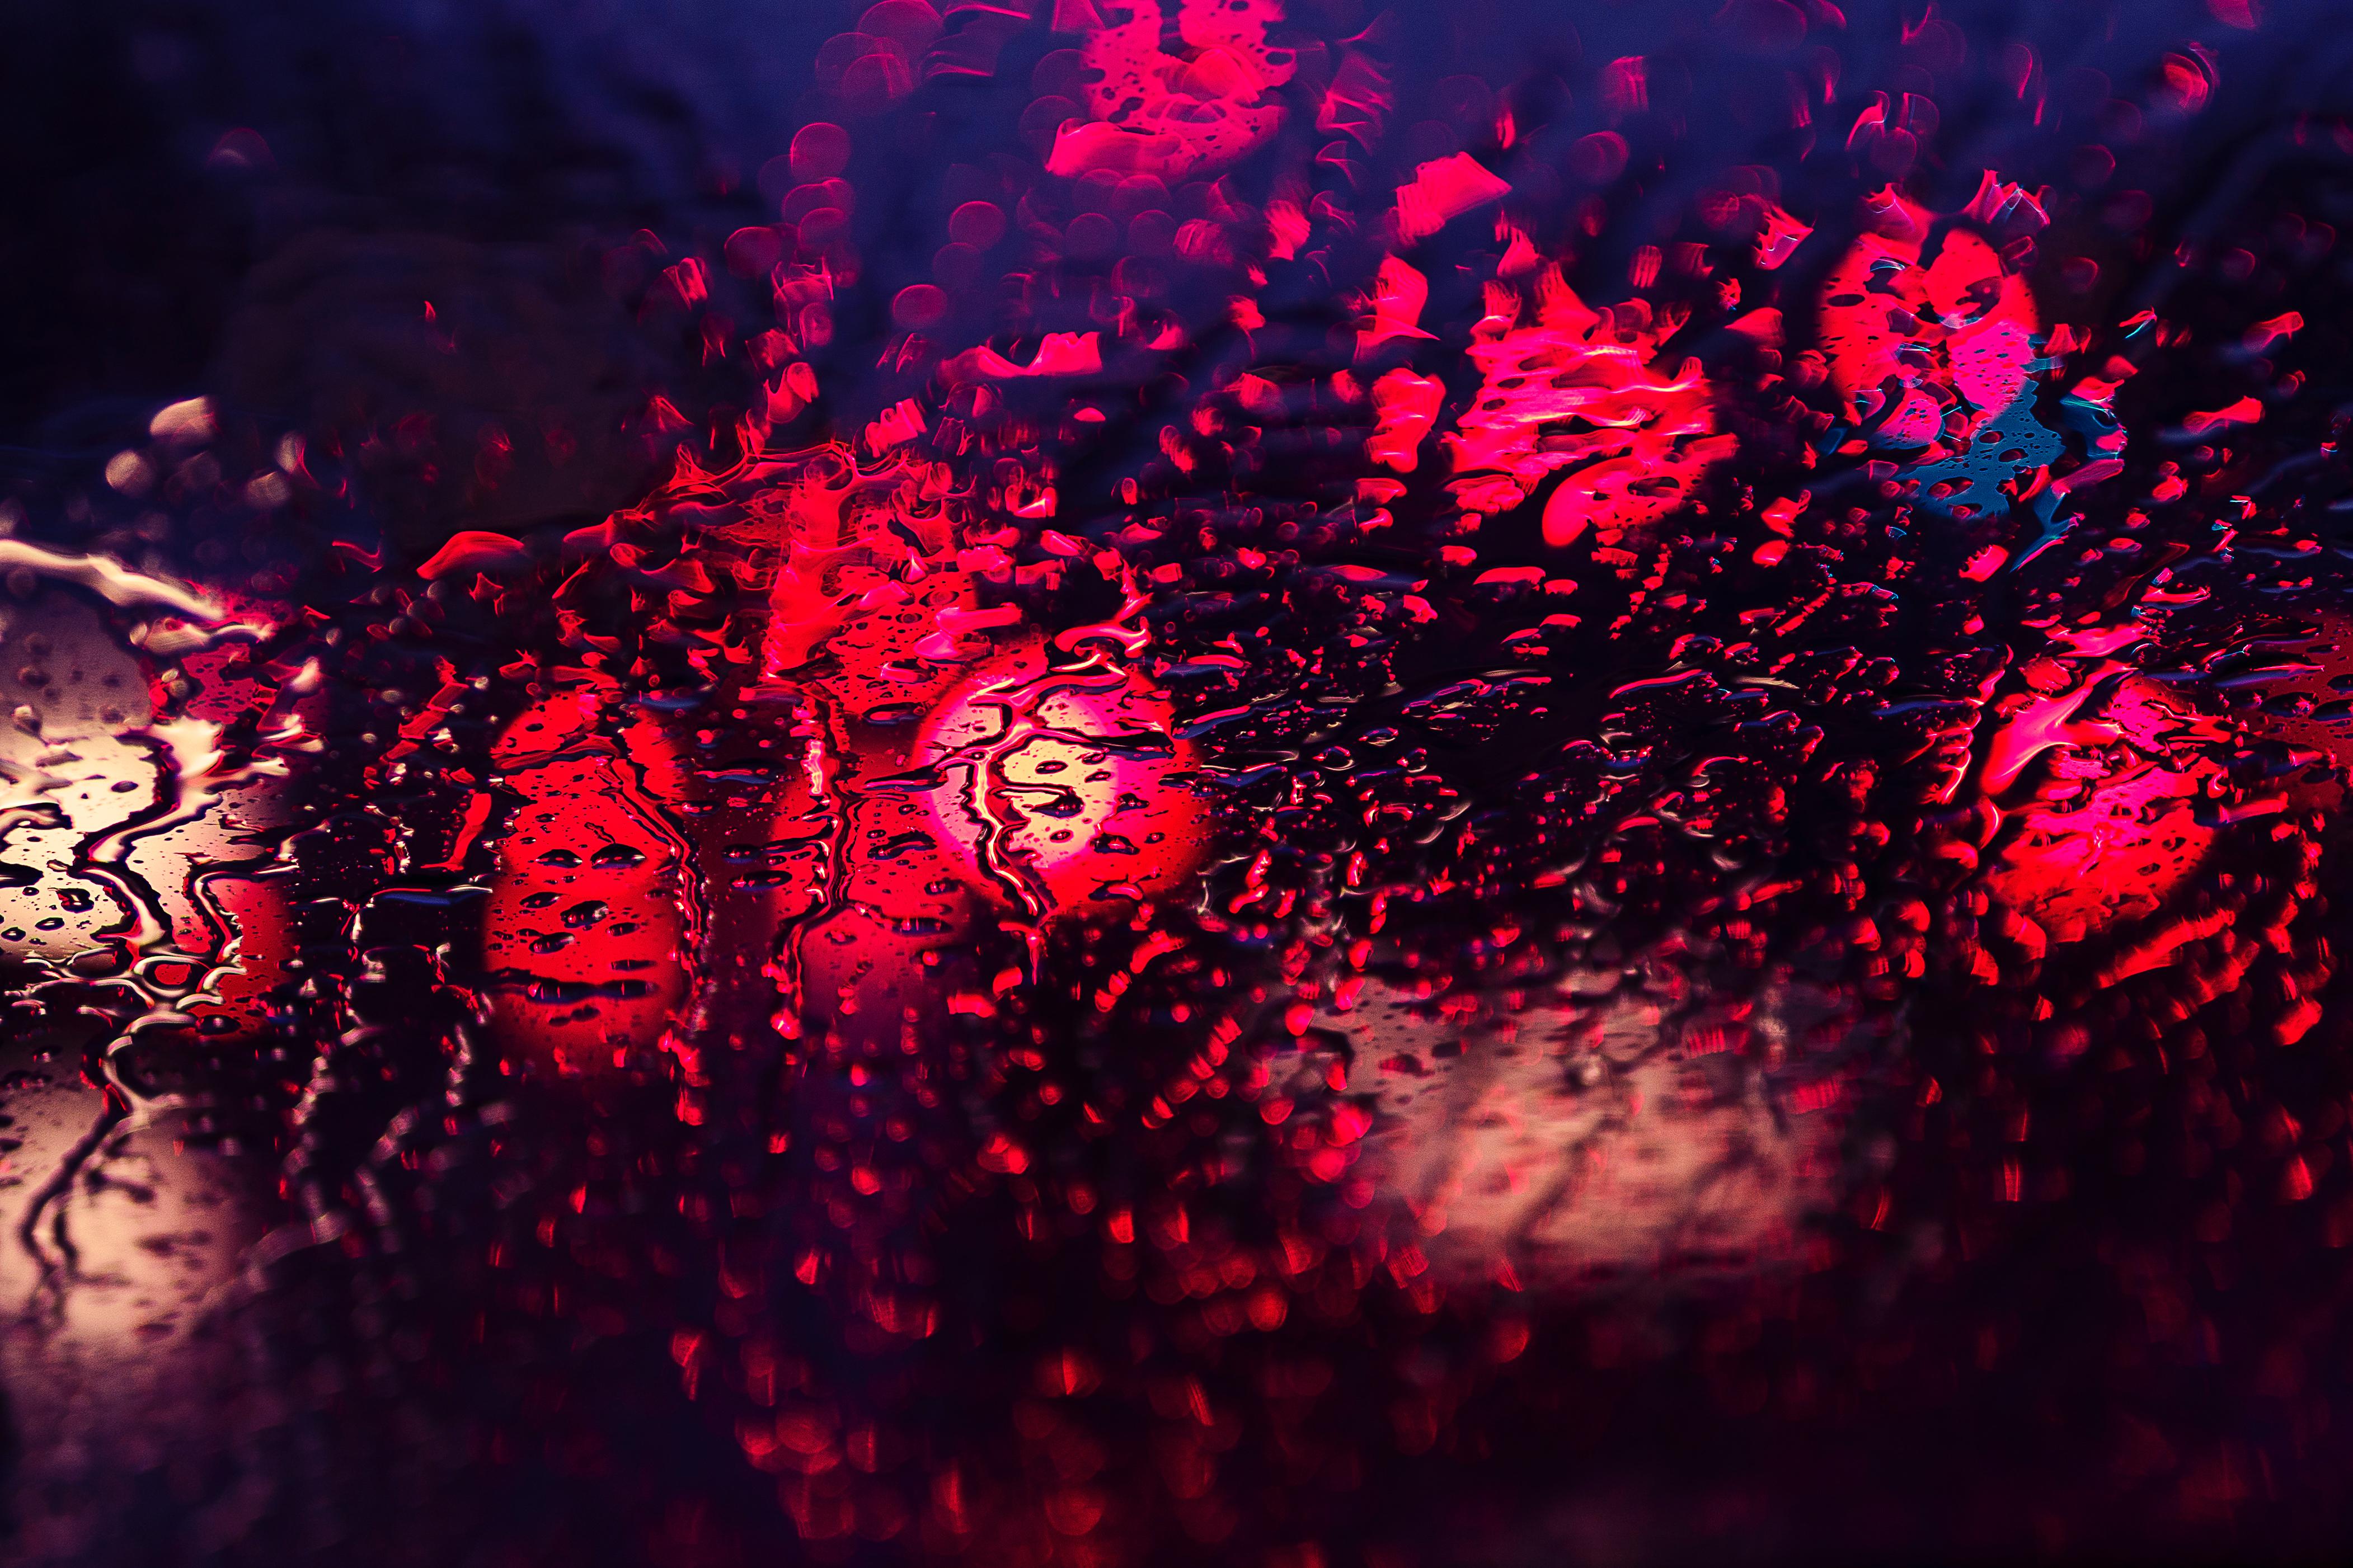 Gambar cahaya malam bunga merah kegelapan kembang api cahaya malam bunga merah kegelapan kembang api komputer wallpaper voltagebd Images